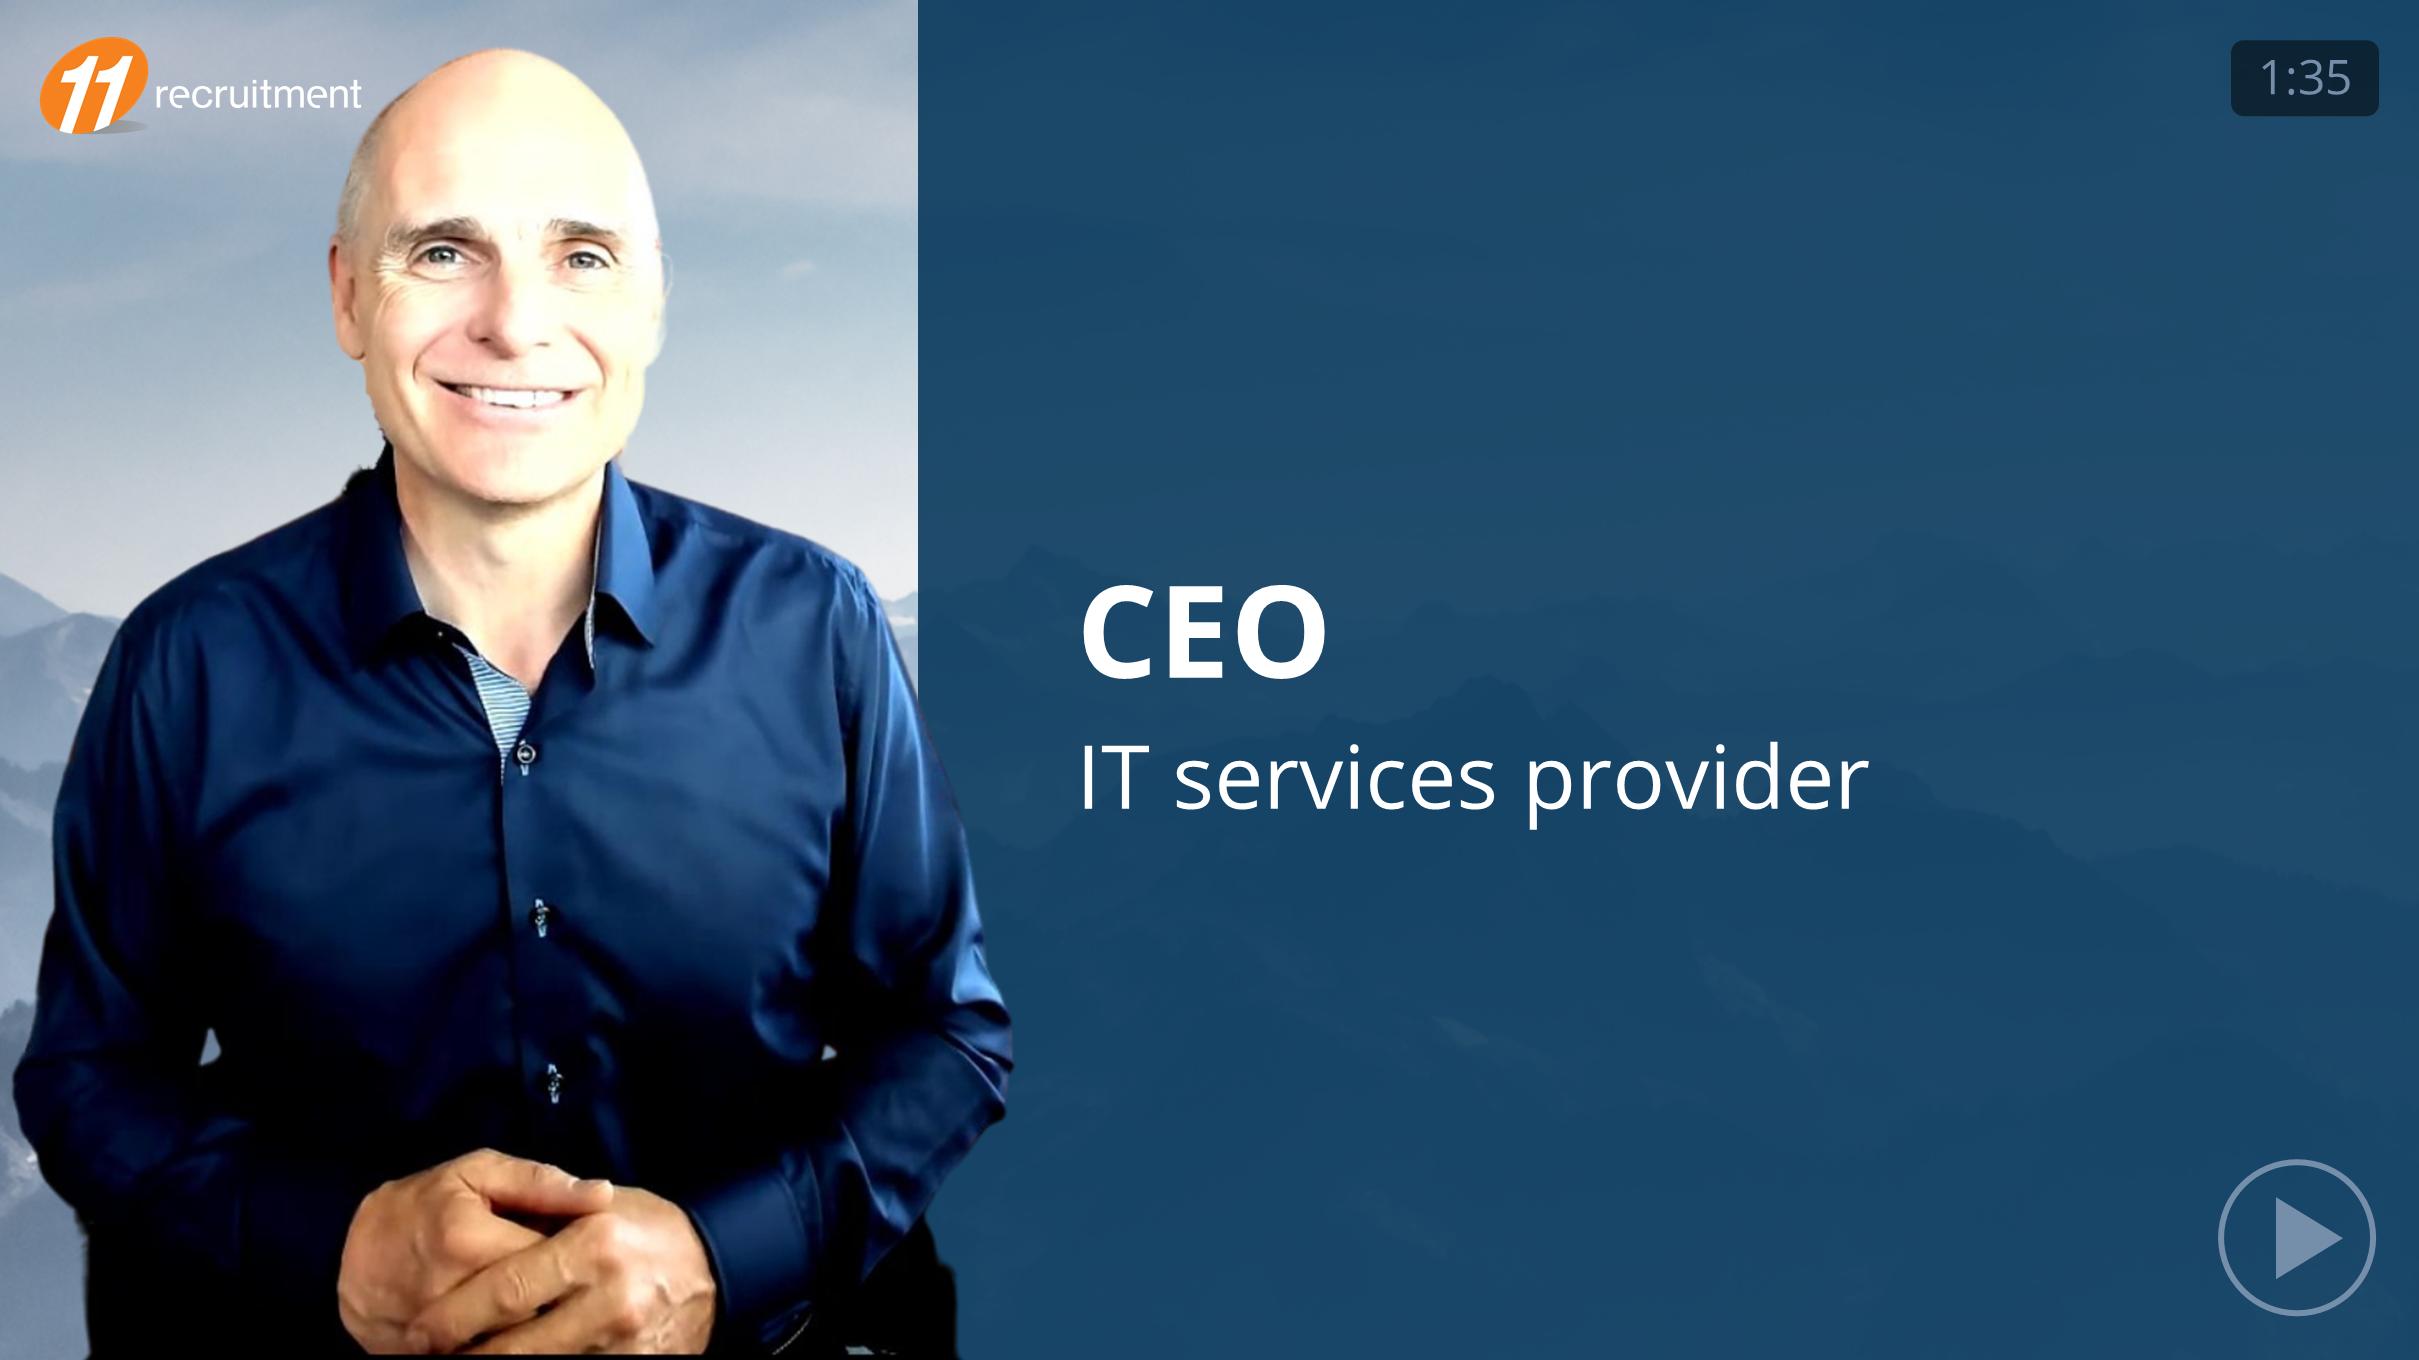 CEO - IT